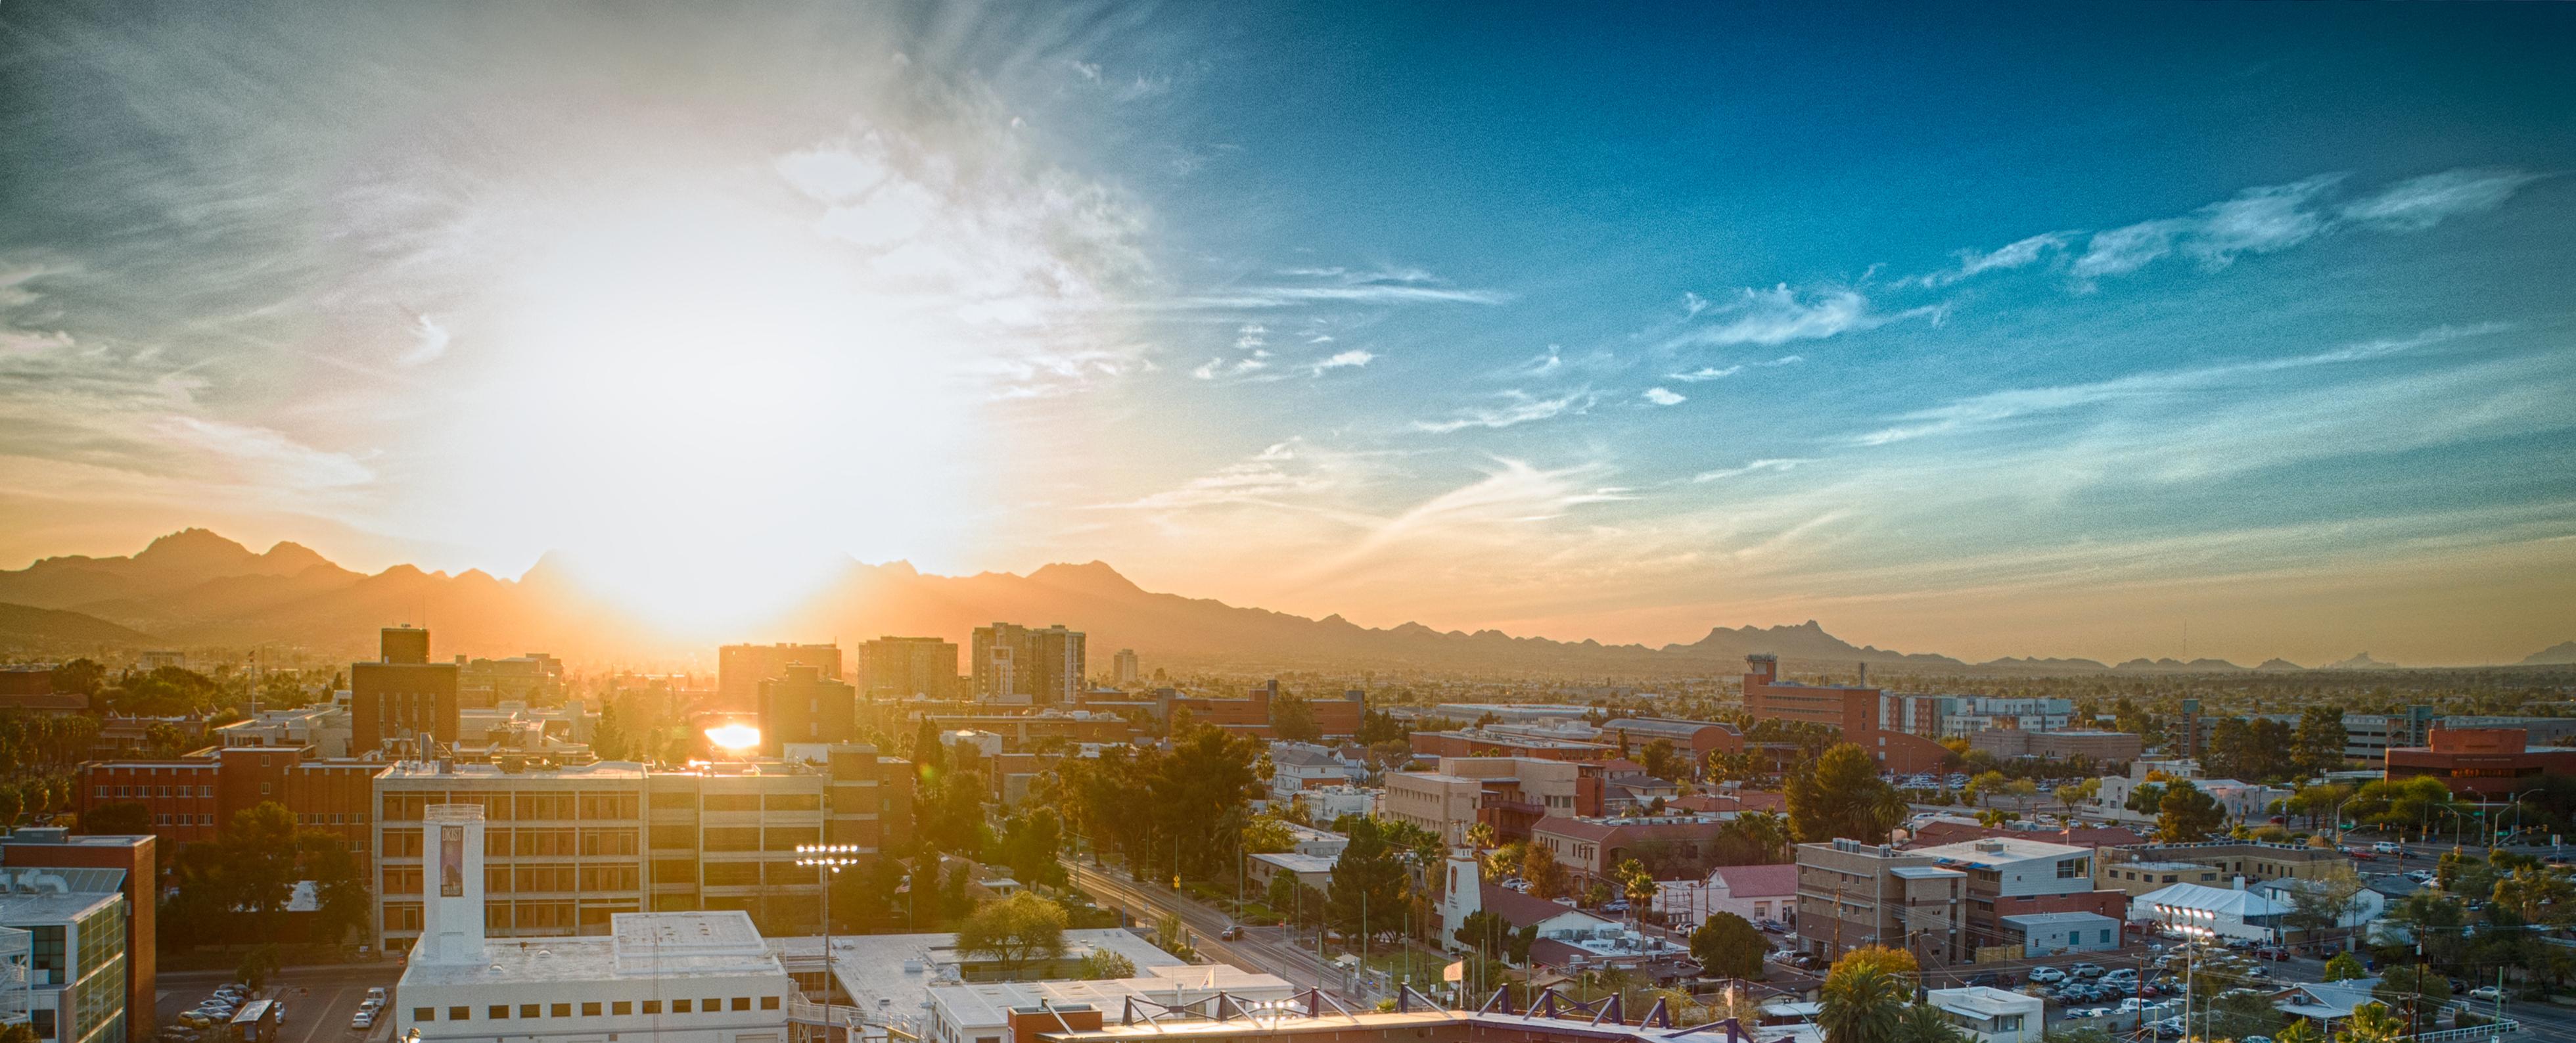 University of Arizona at sunset